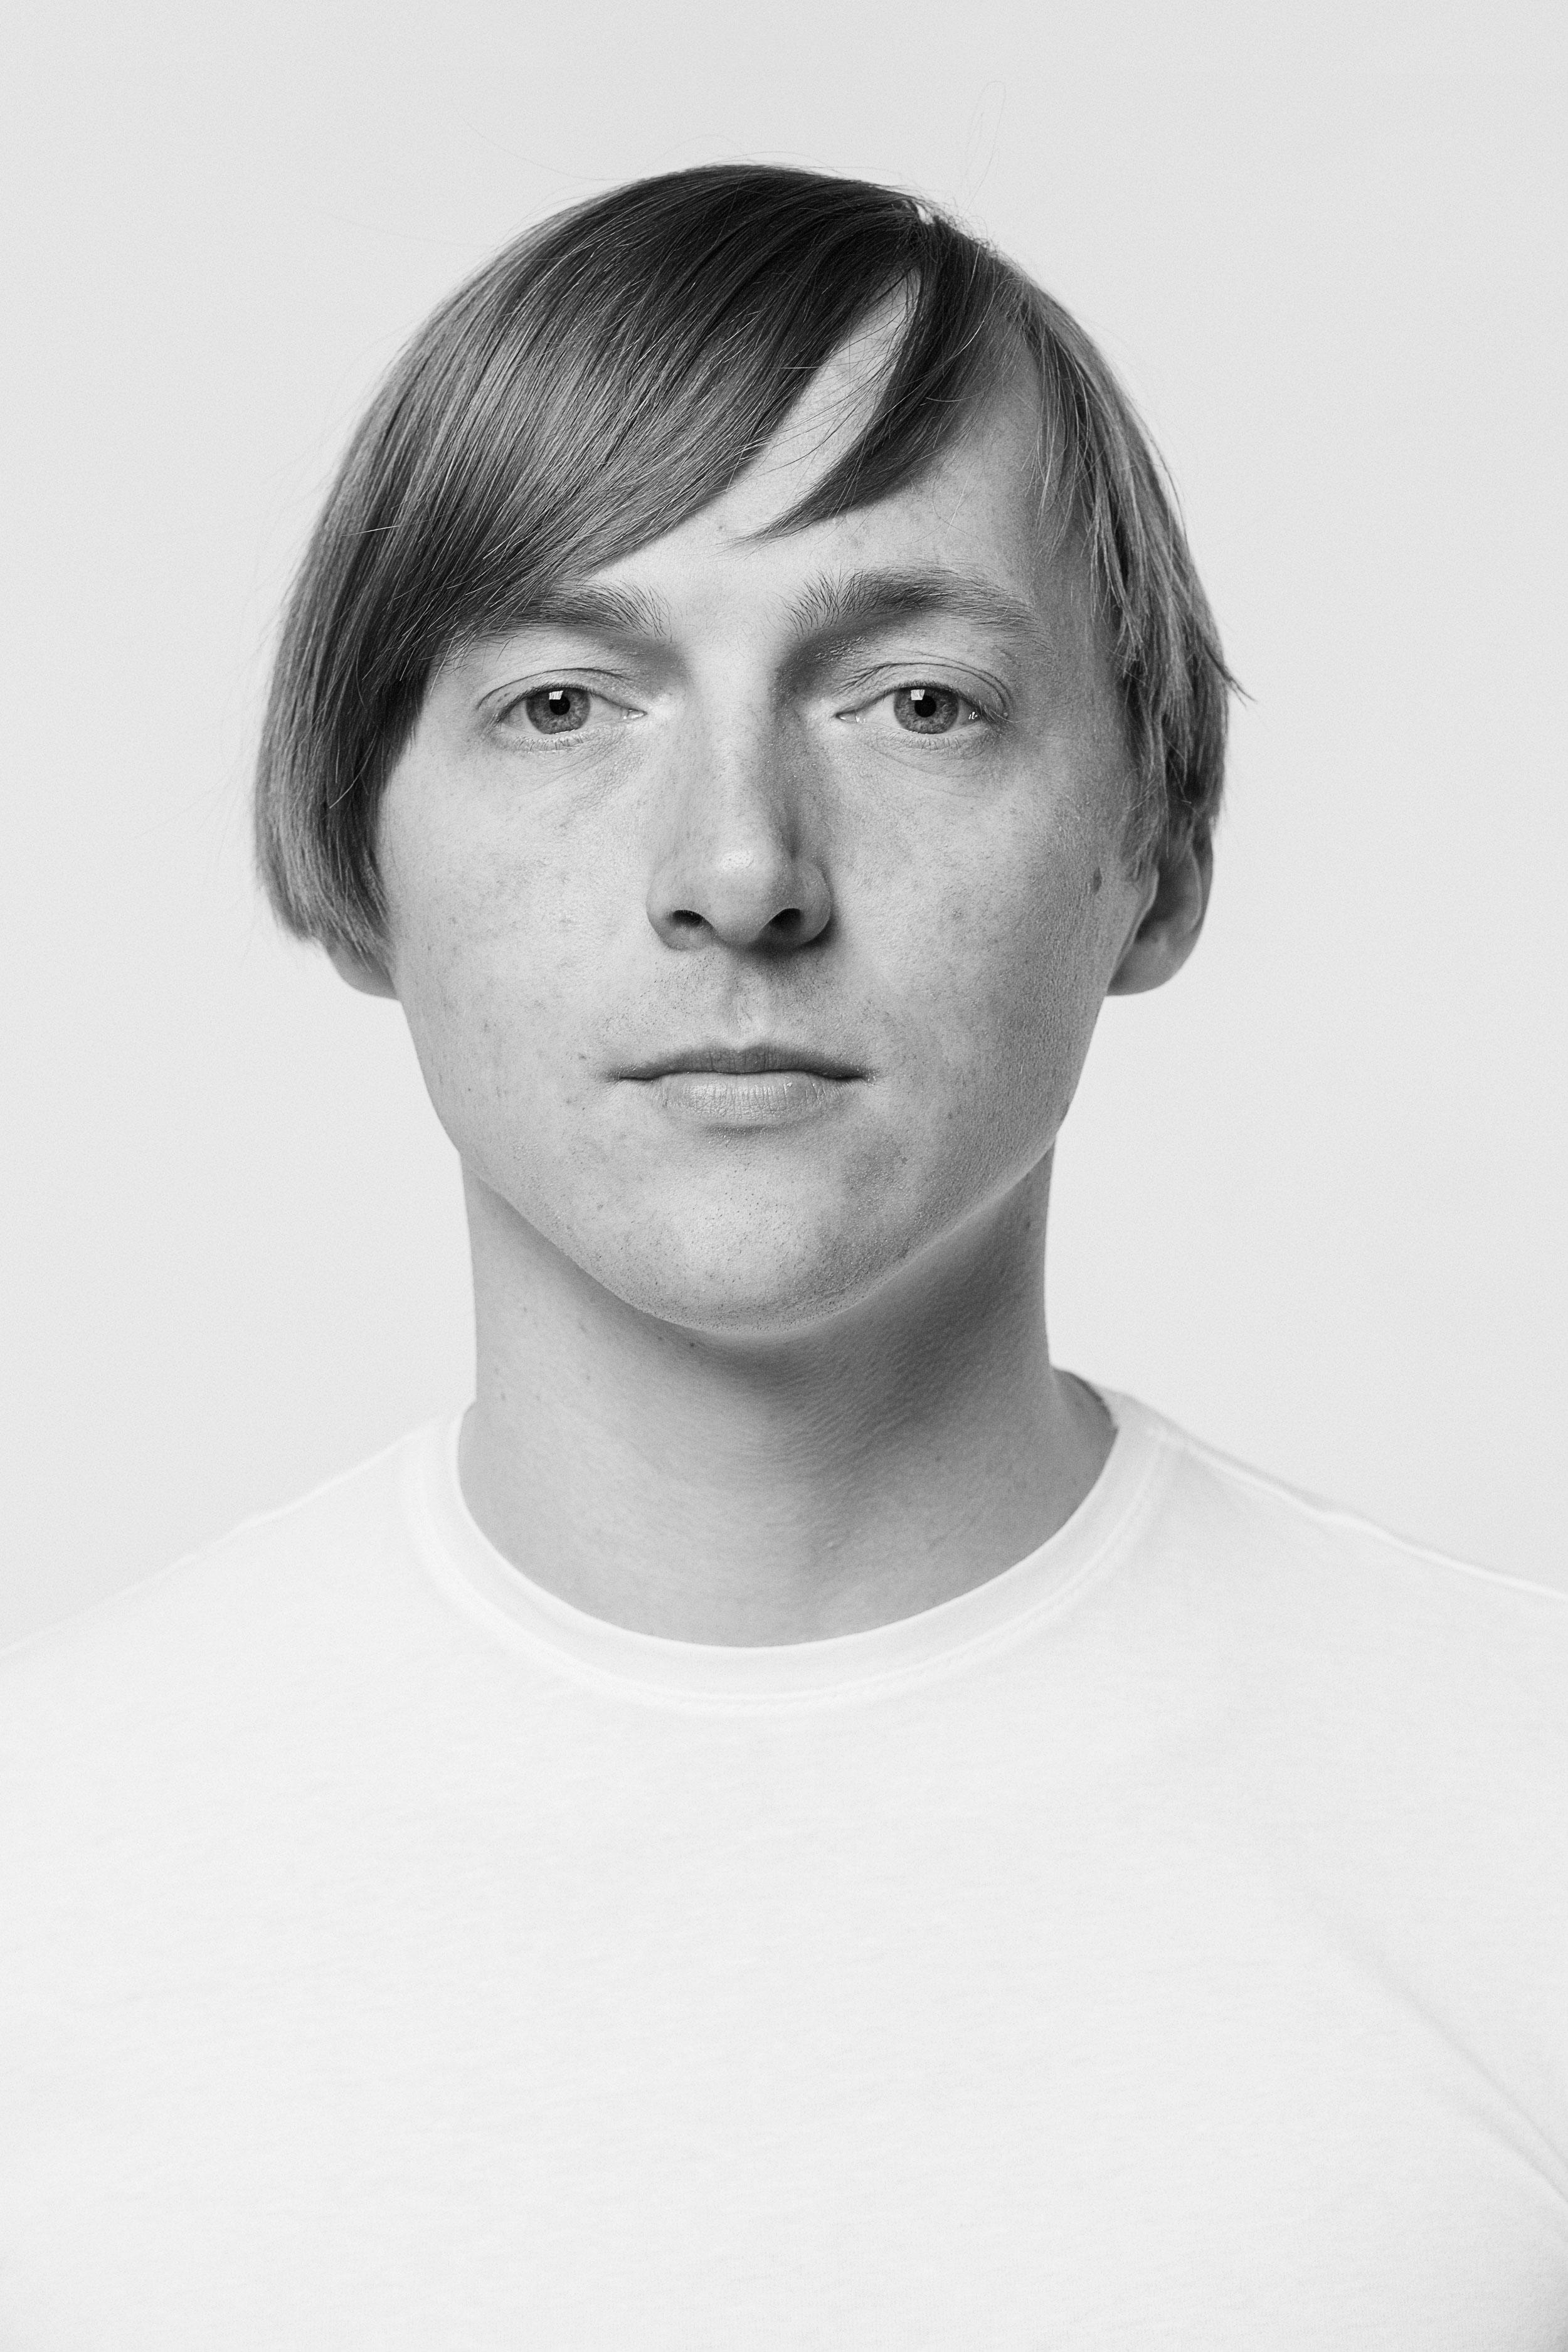 Tadas Maksimovas. Born on 2 February, 1983.